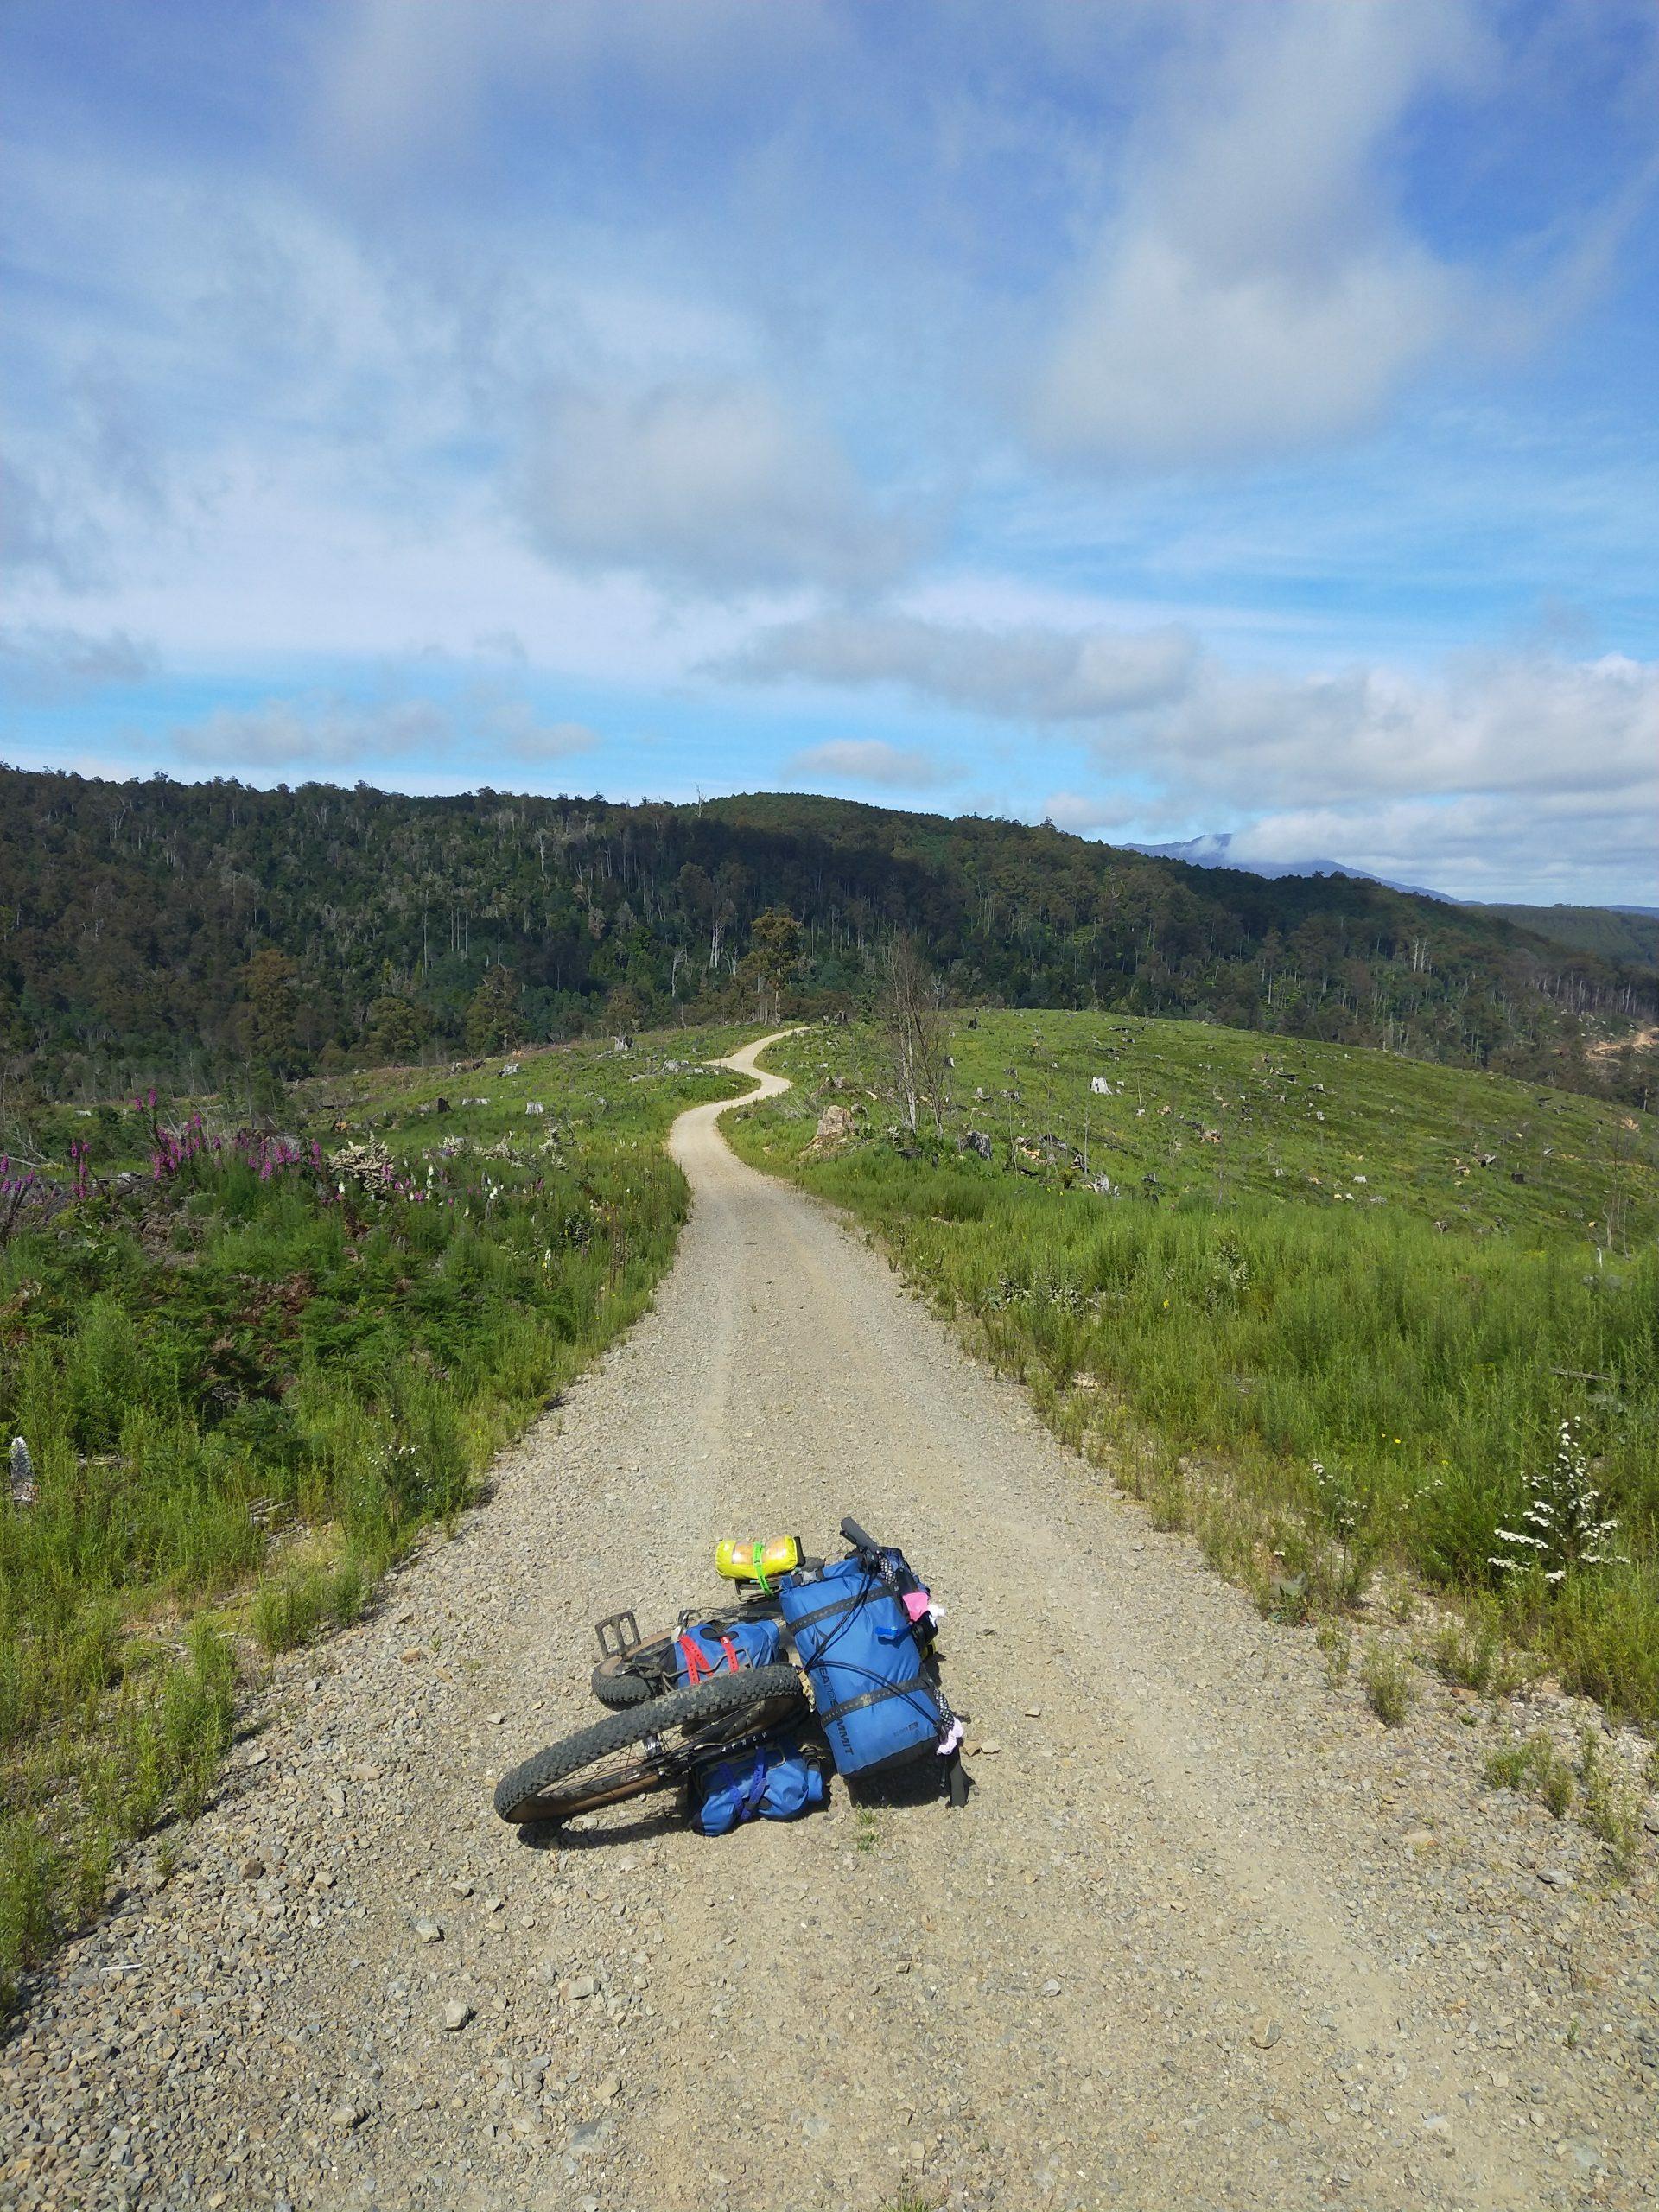 Surly Bikepacking bike in Tasmania on a gravel road